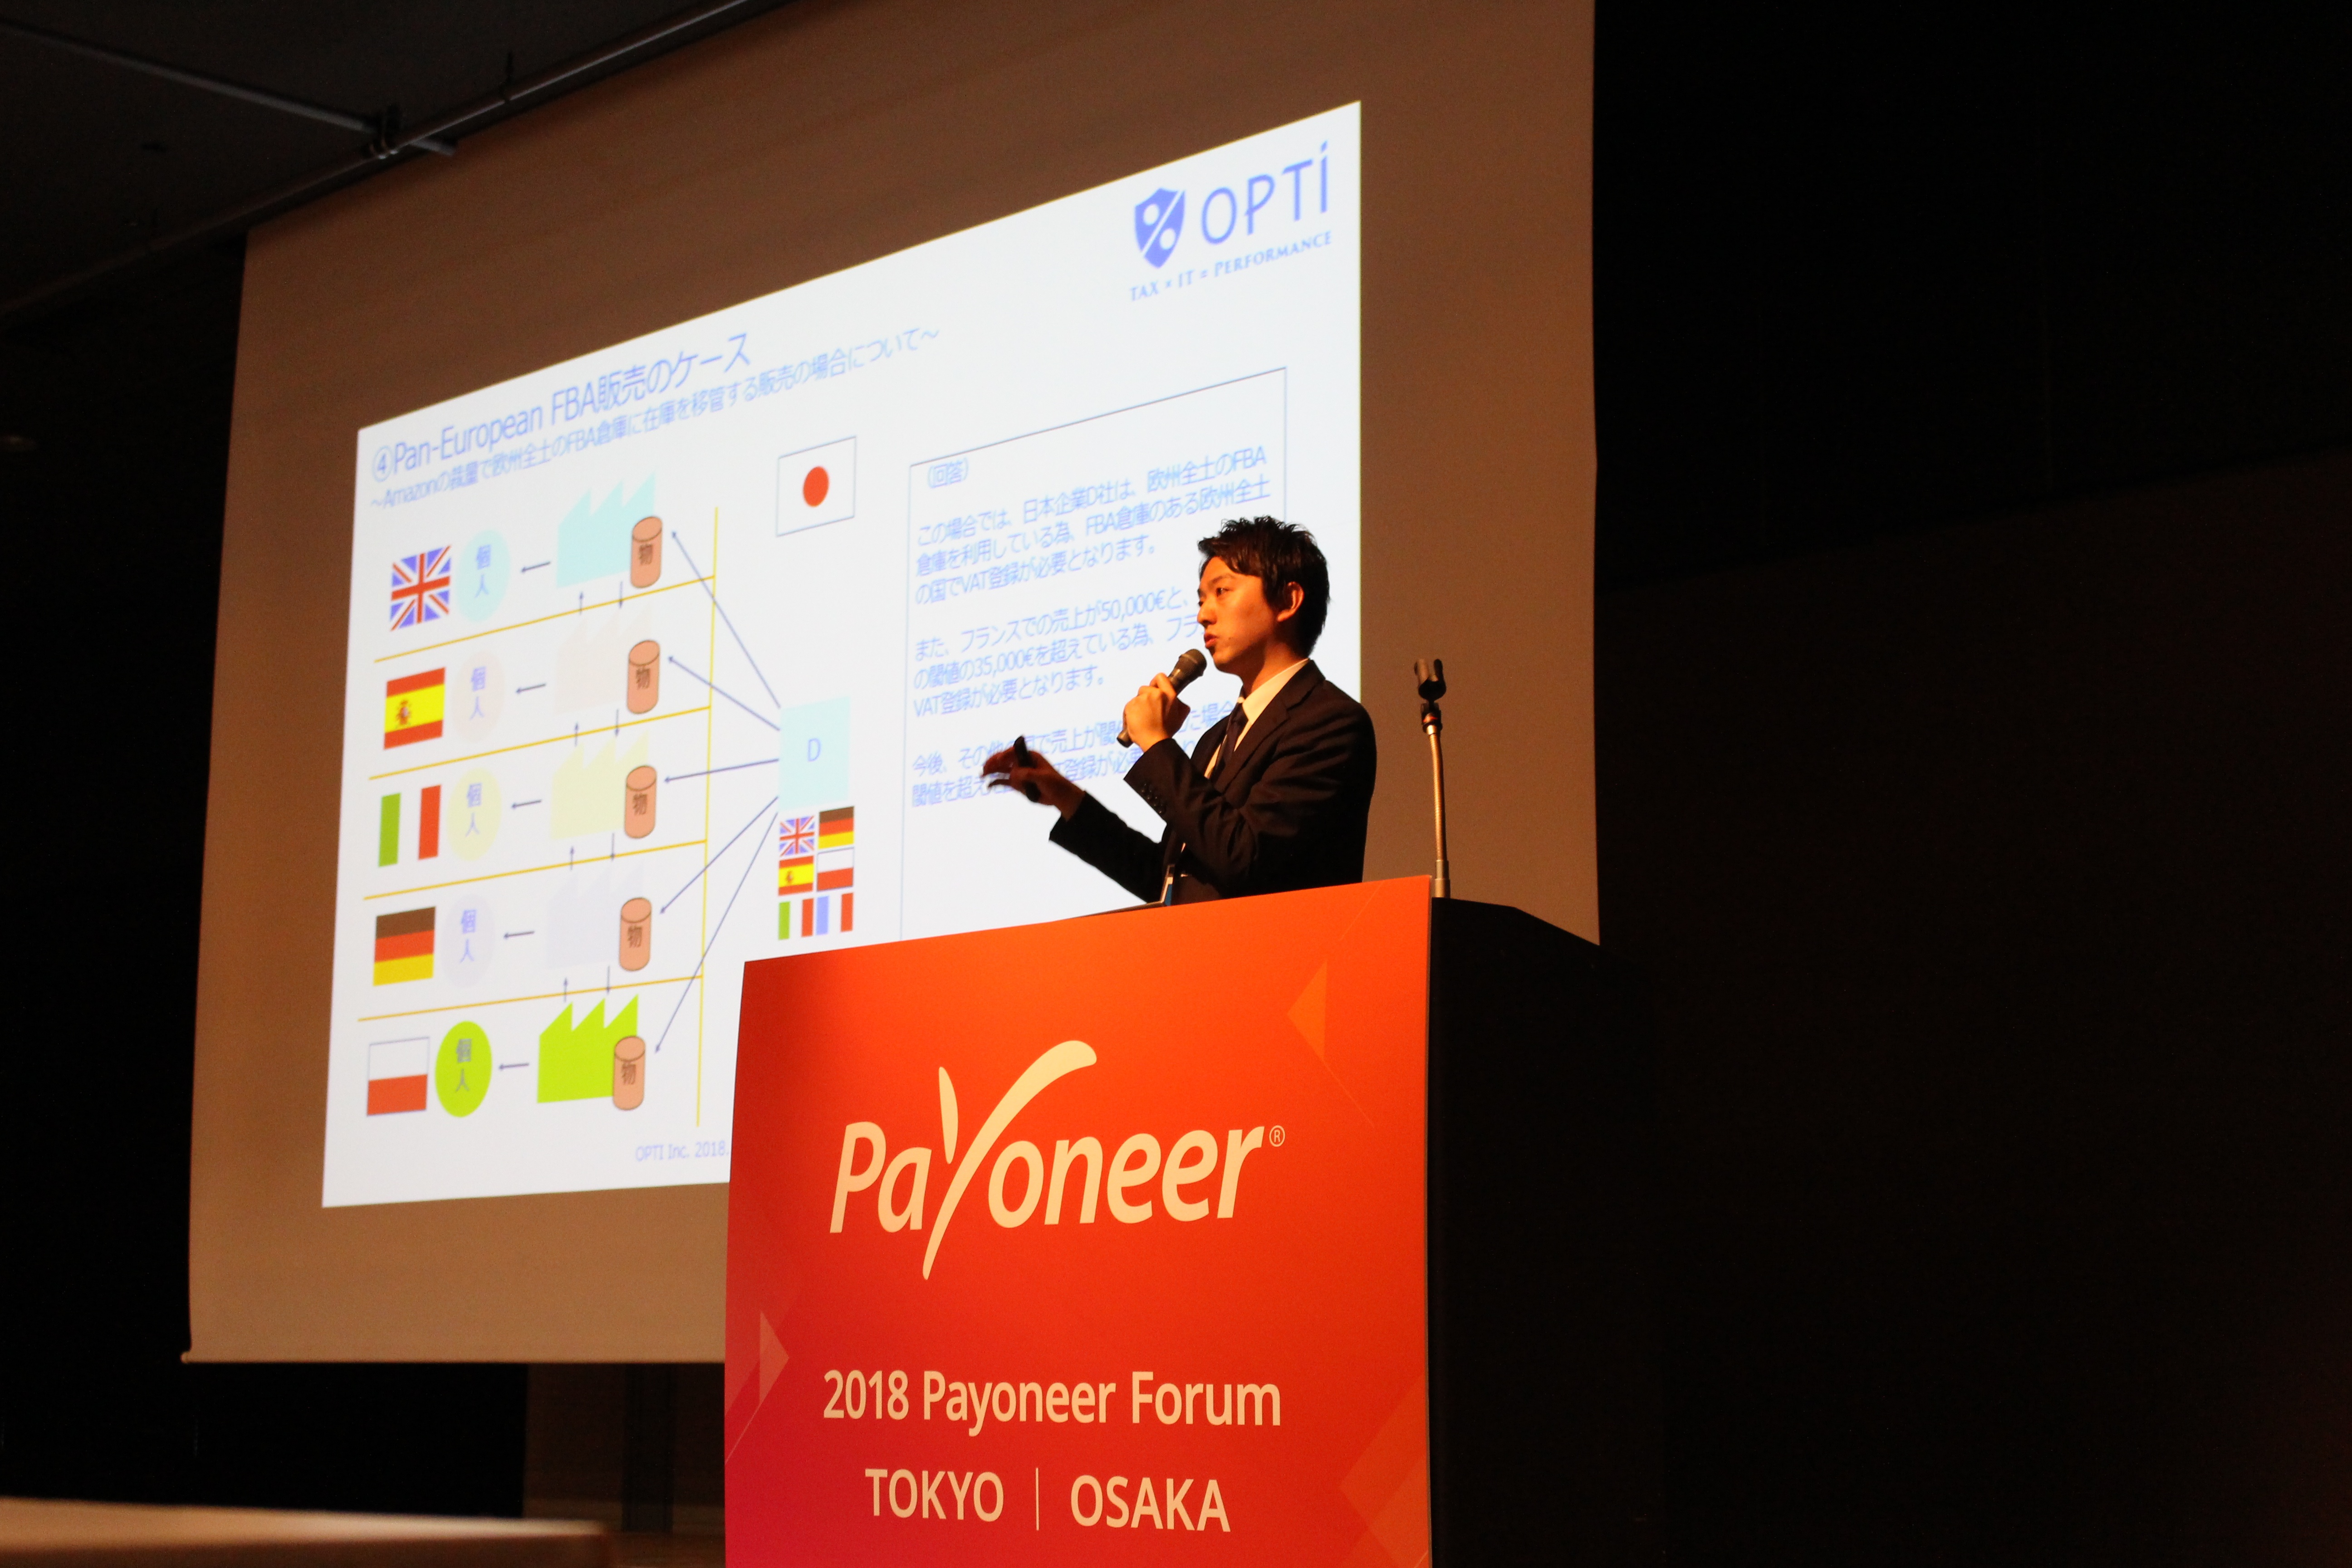 Payoneer Forumにて当社寄吉が登壇しました